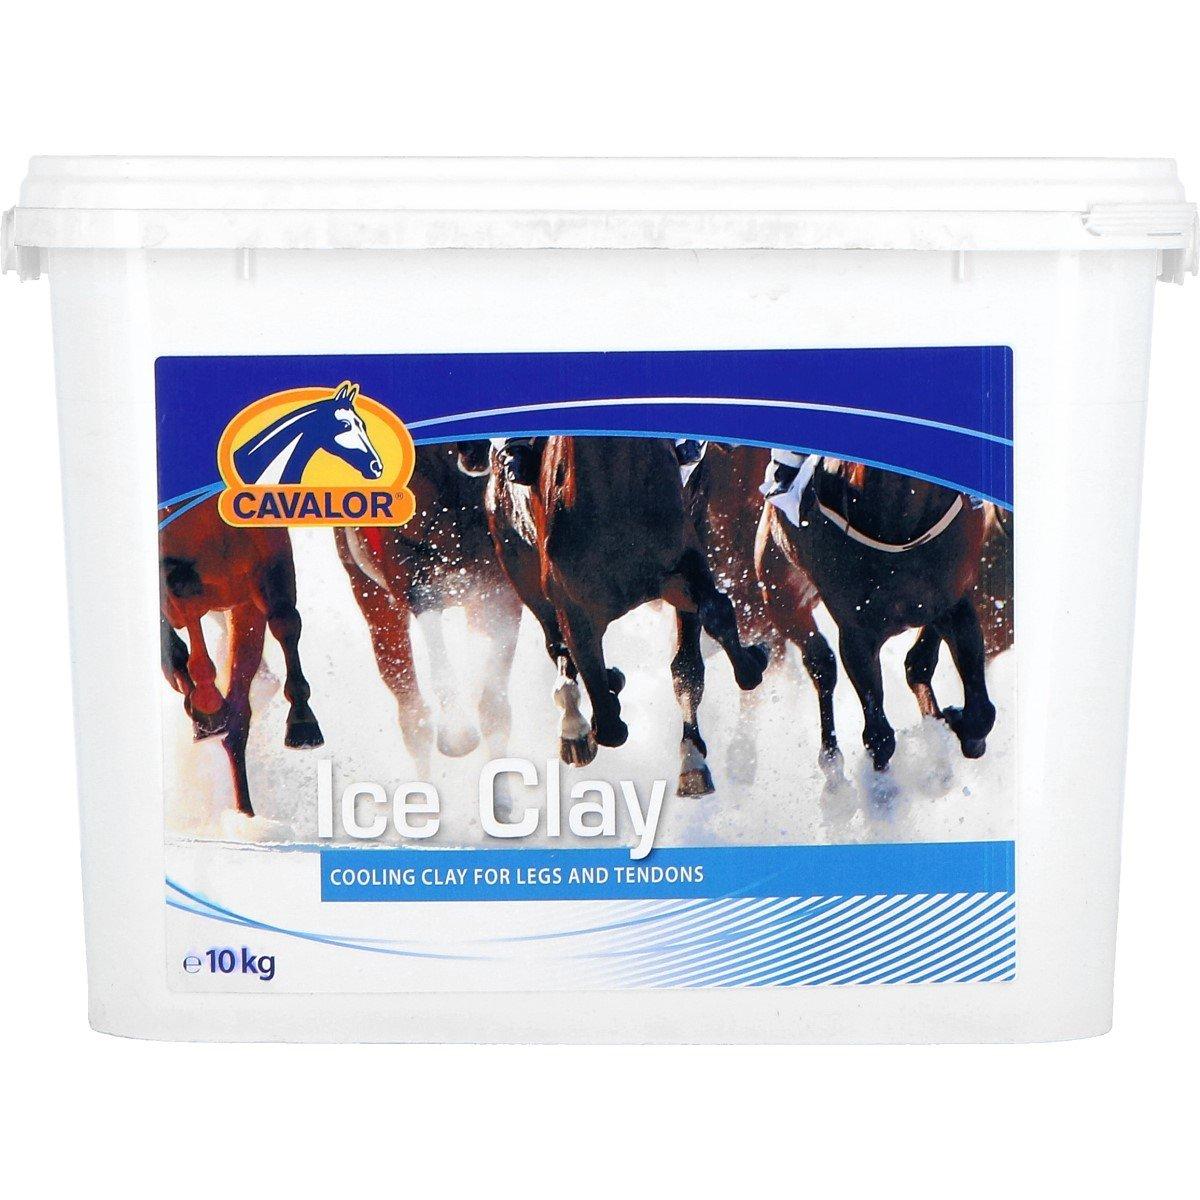 Afbeelding van Cavalor Ice Clay 10 kg